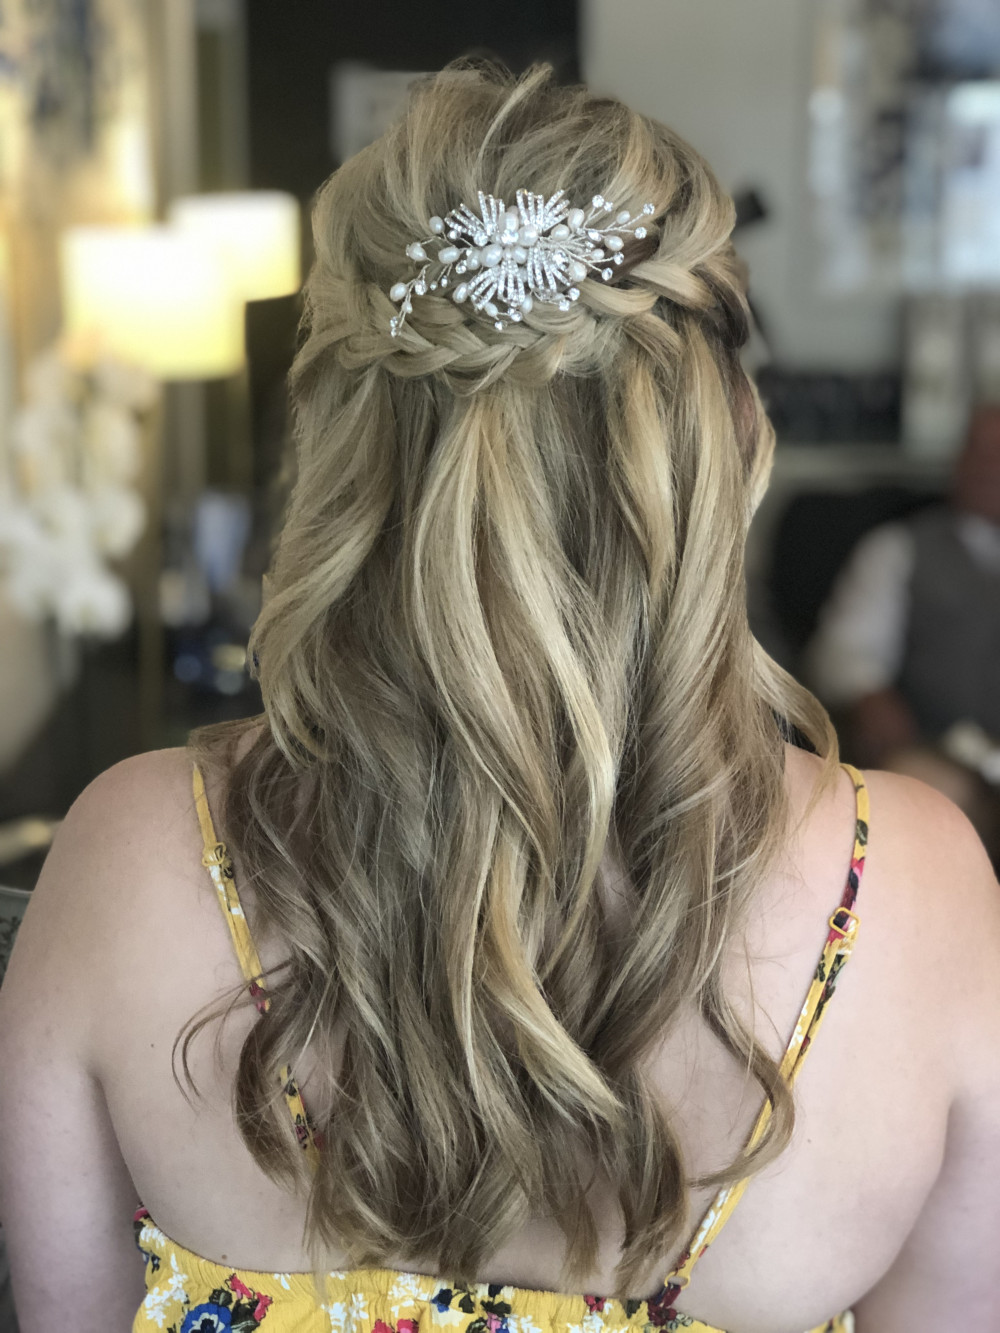 - Make Me Bridal Artist: Flaming Bride. #flowersinherhair #boho #halfuphair #bohowaves